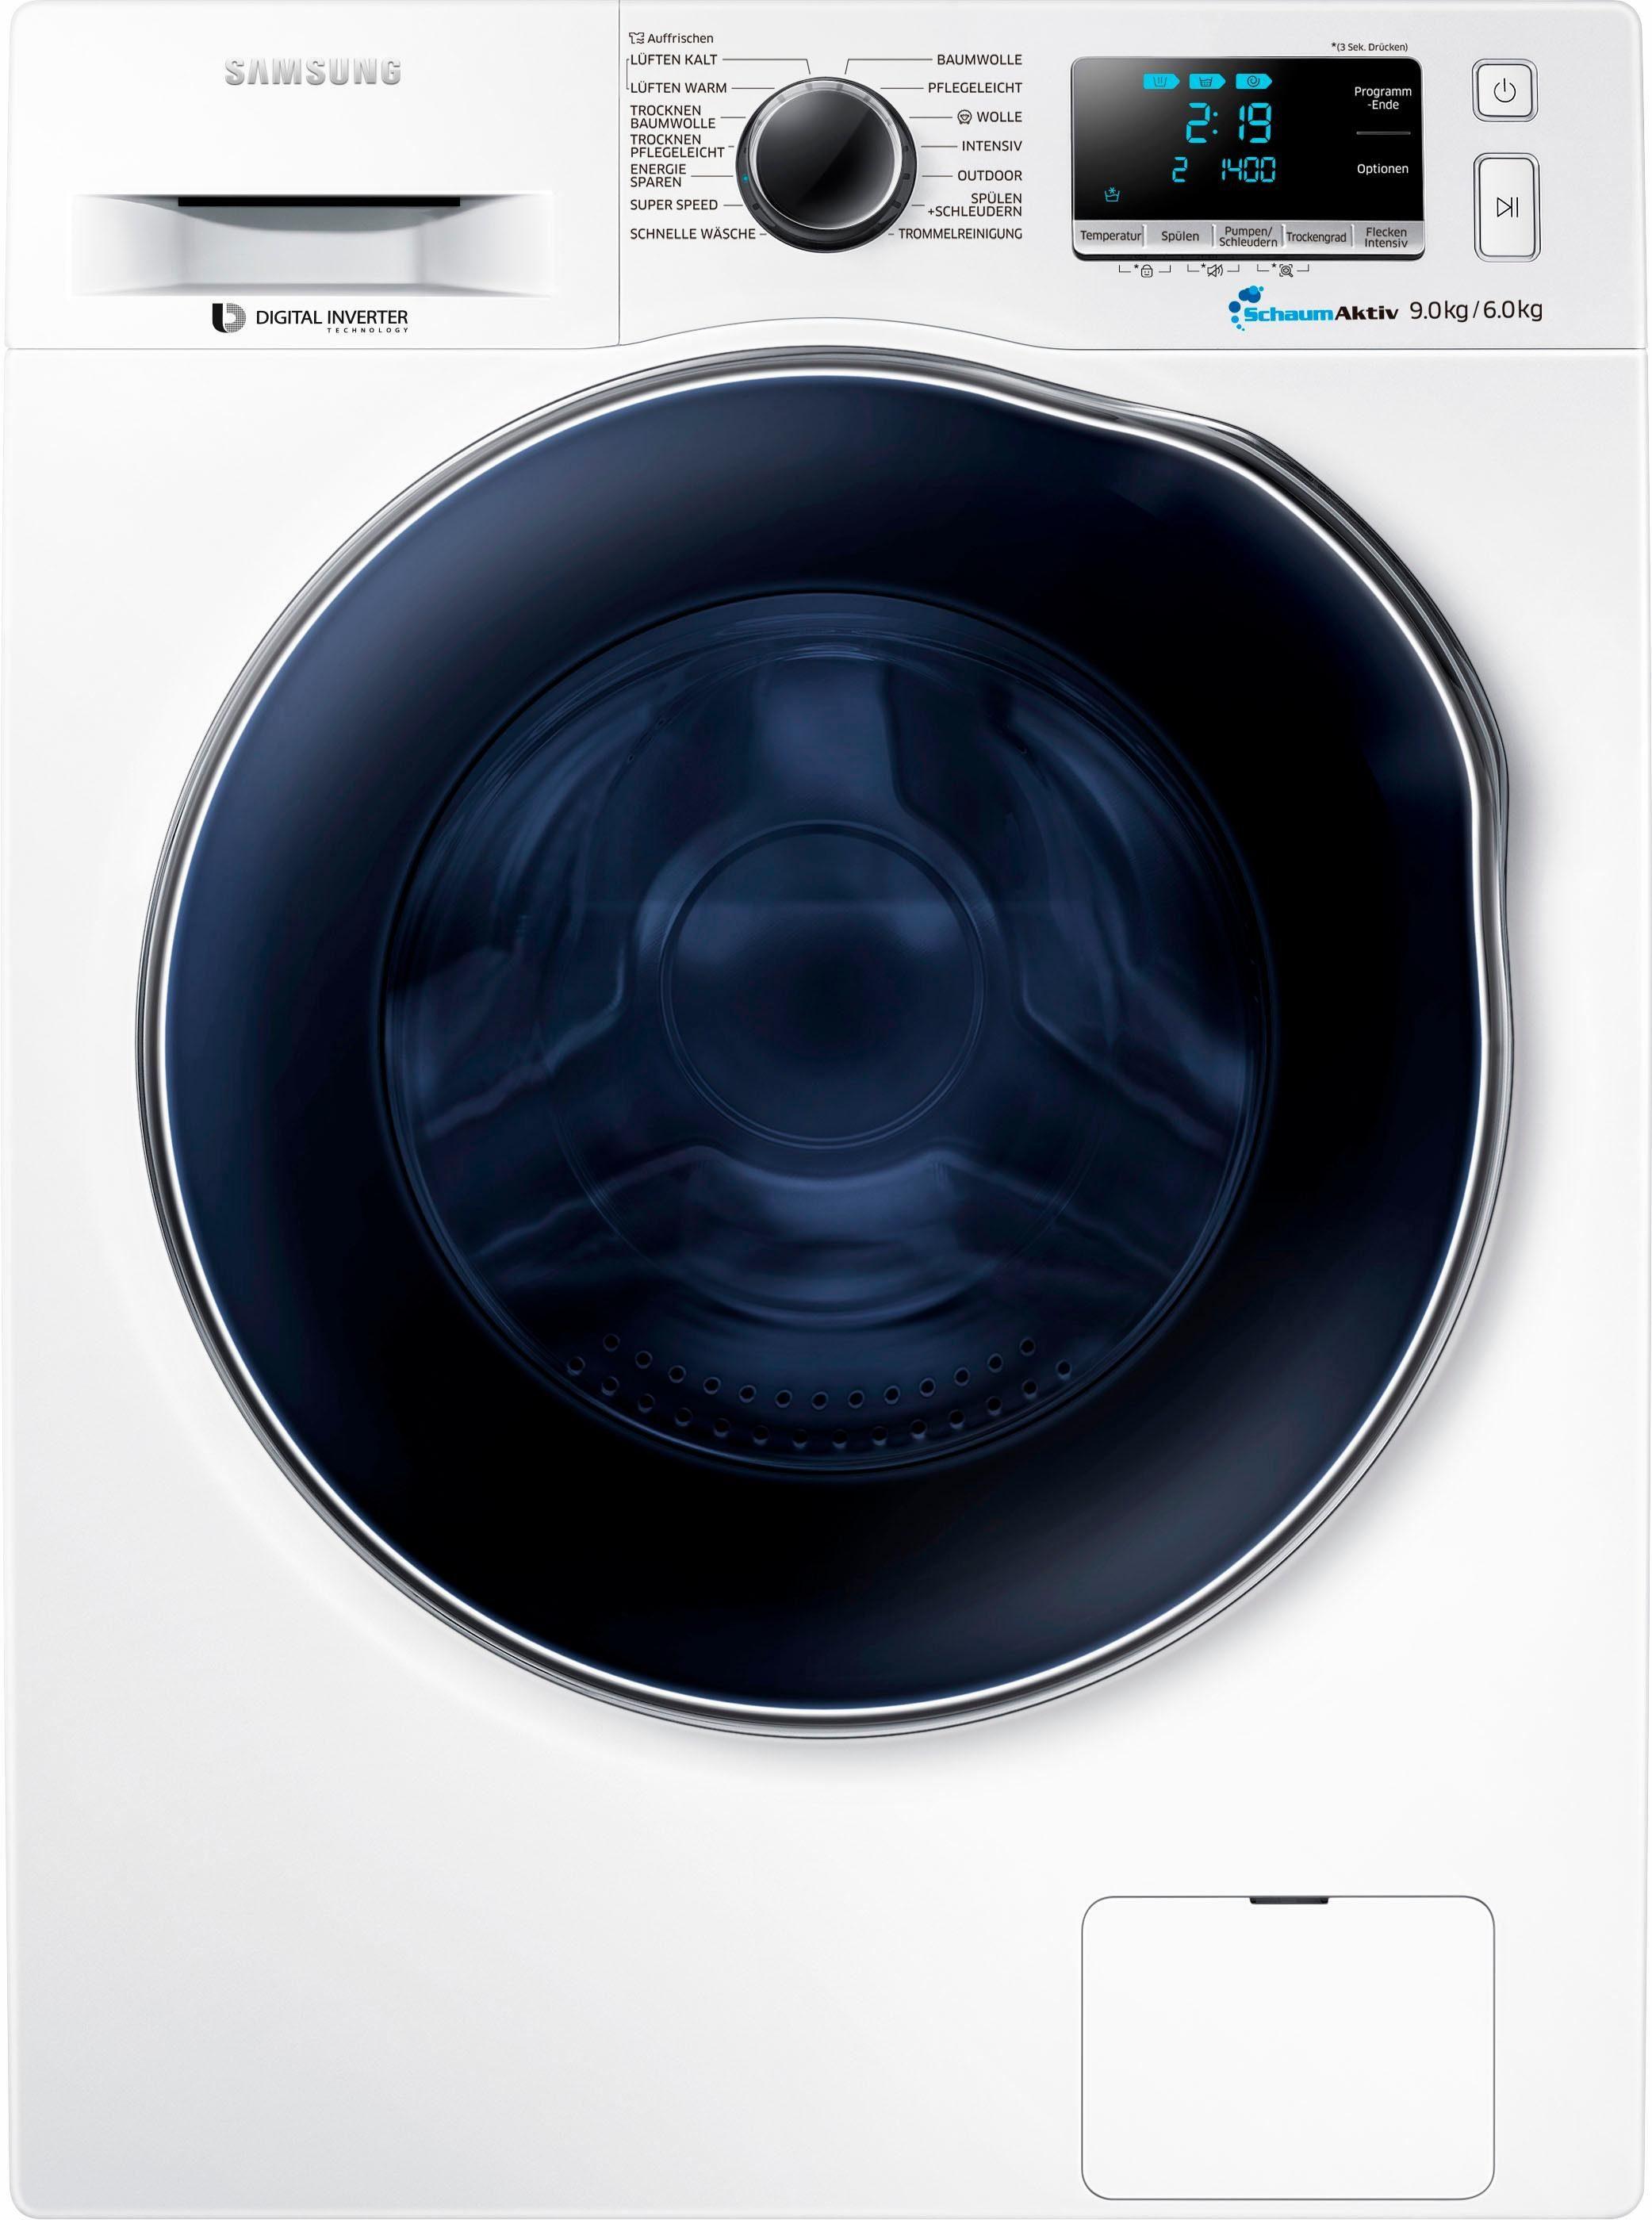 Samsung Waschtrockner WD6000, 9 kg/6 kg, 1400 U/Min, Super Speed